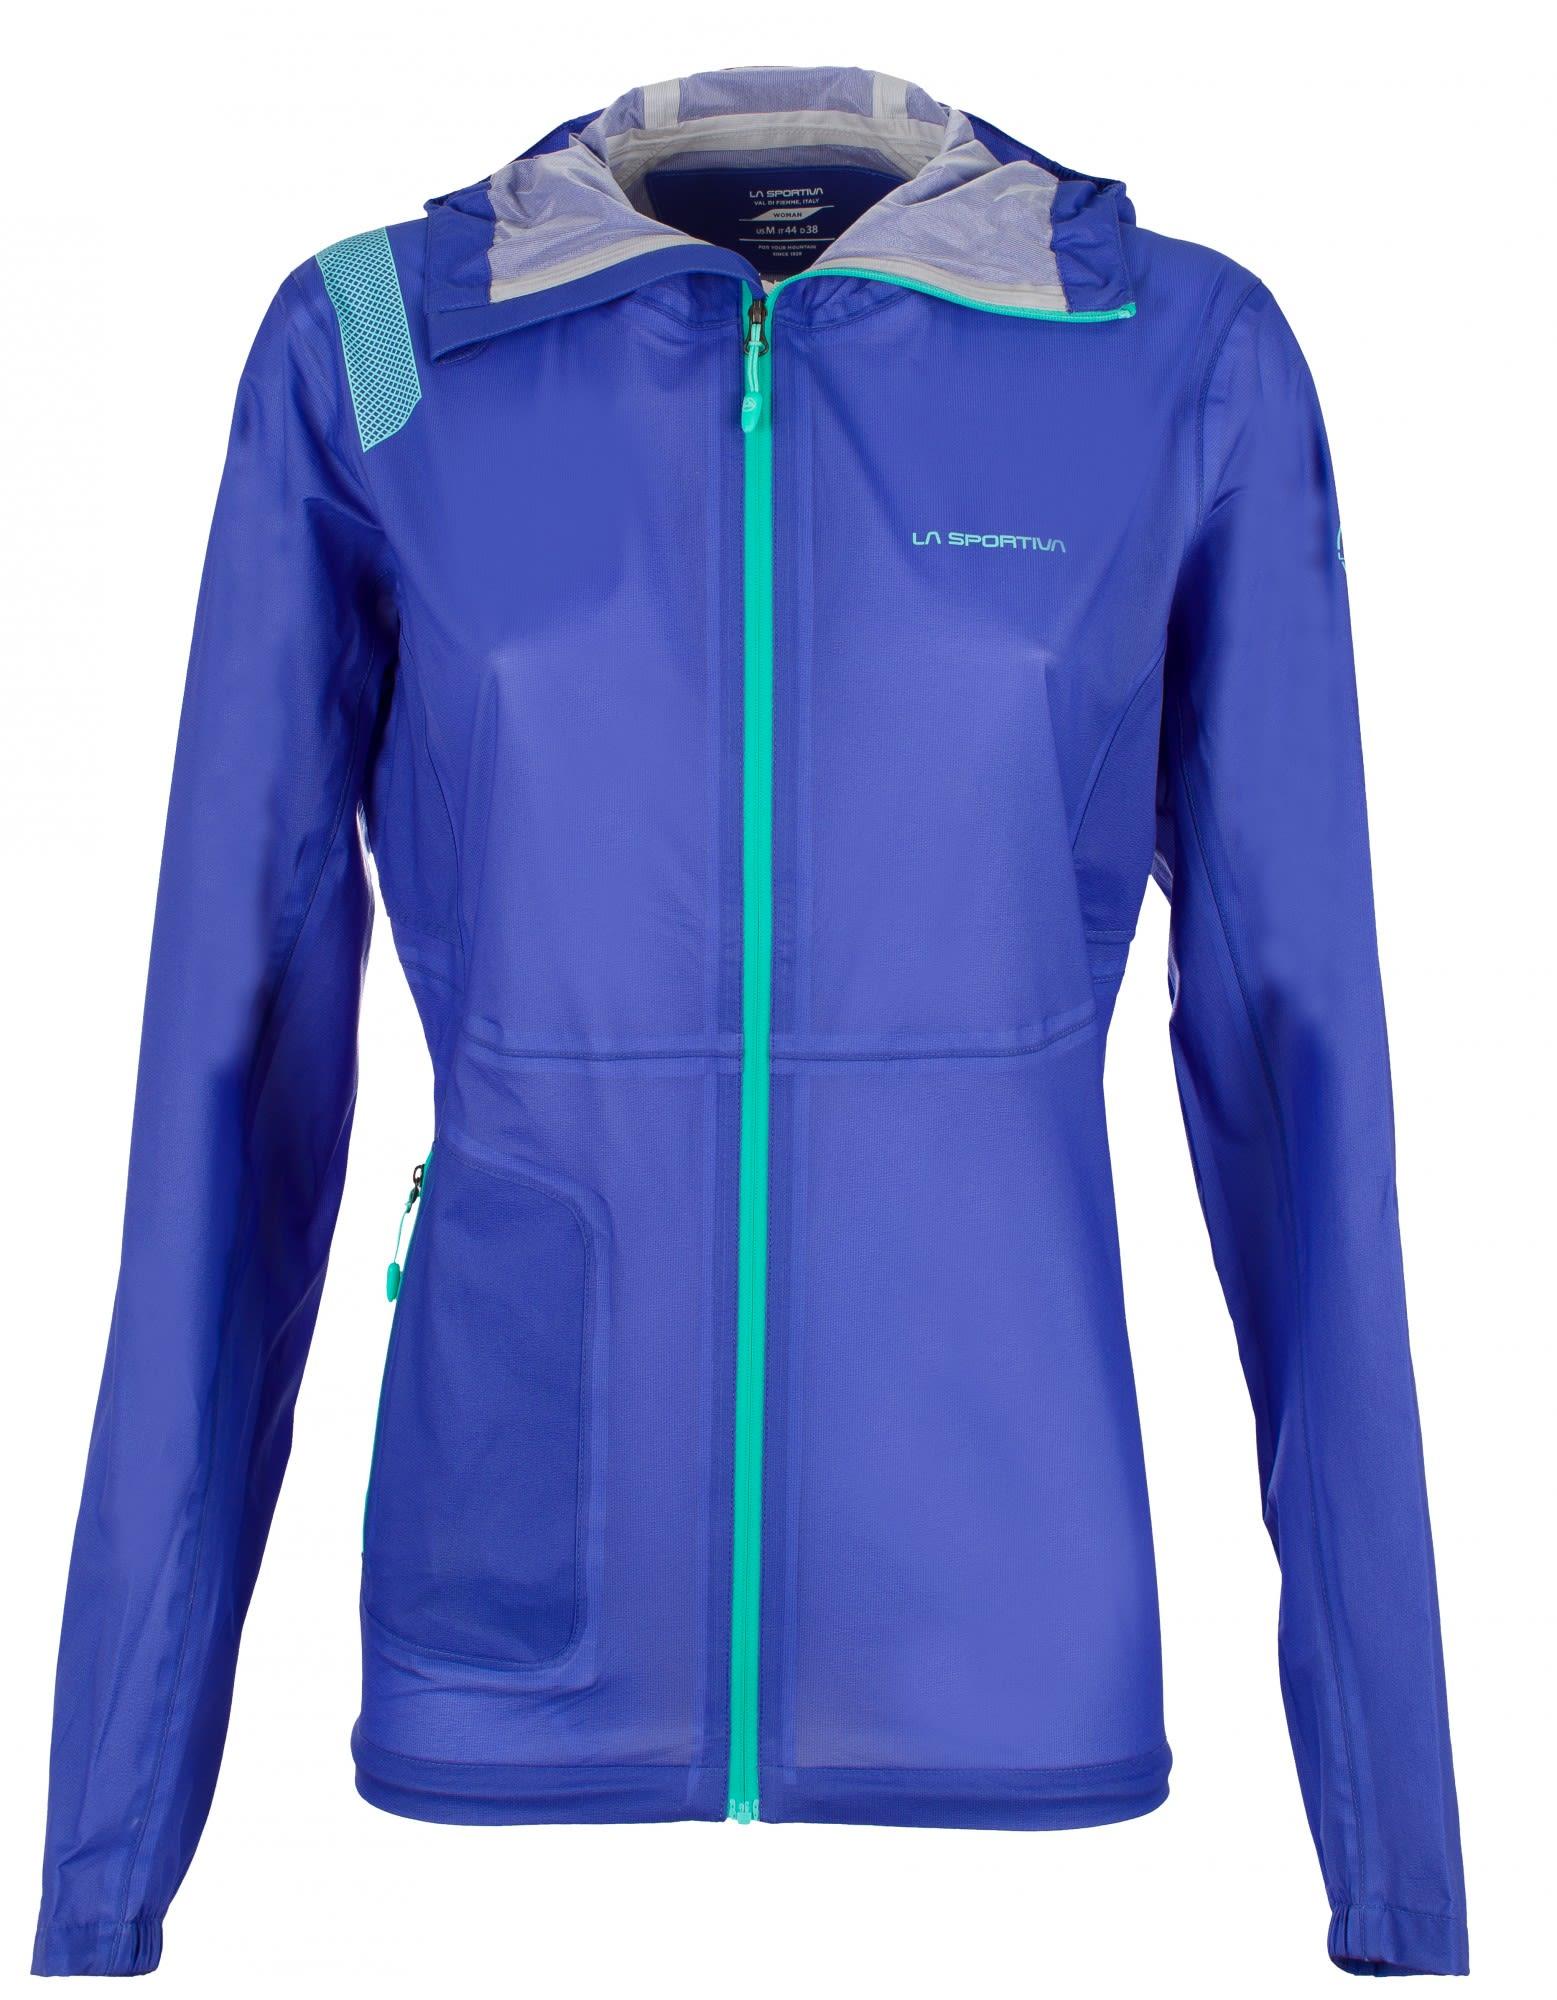 La Sportiva Hail Jacket Blau, Female Freizeitjacke, S